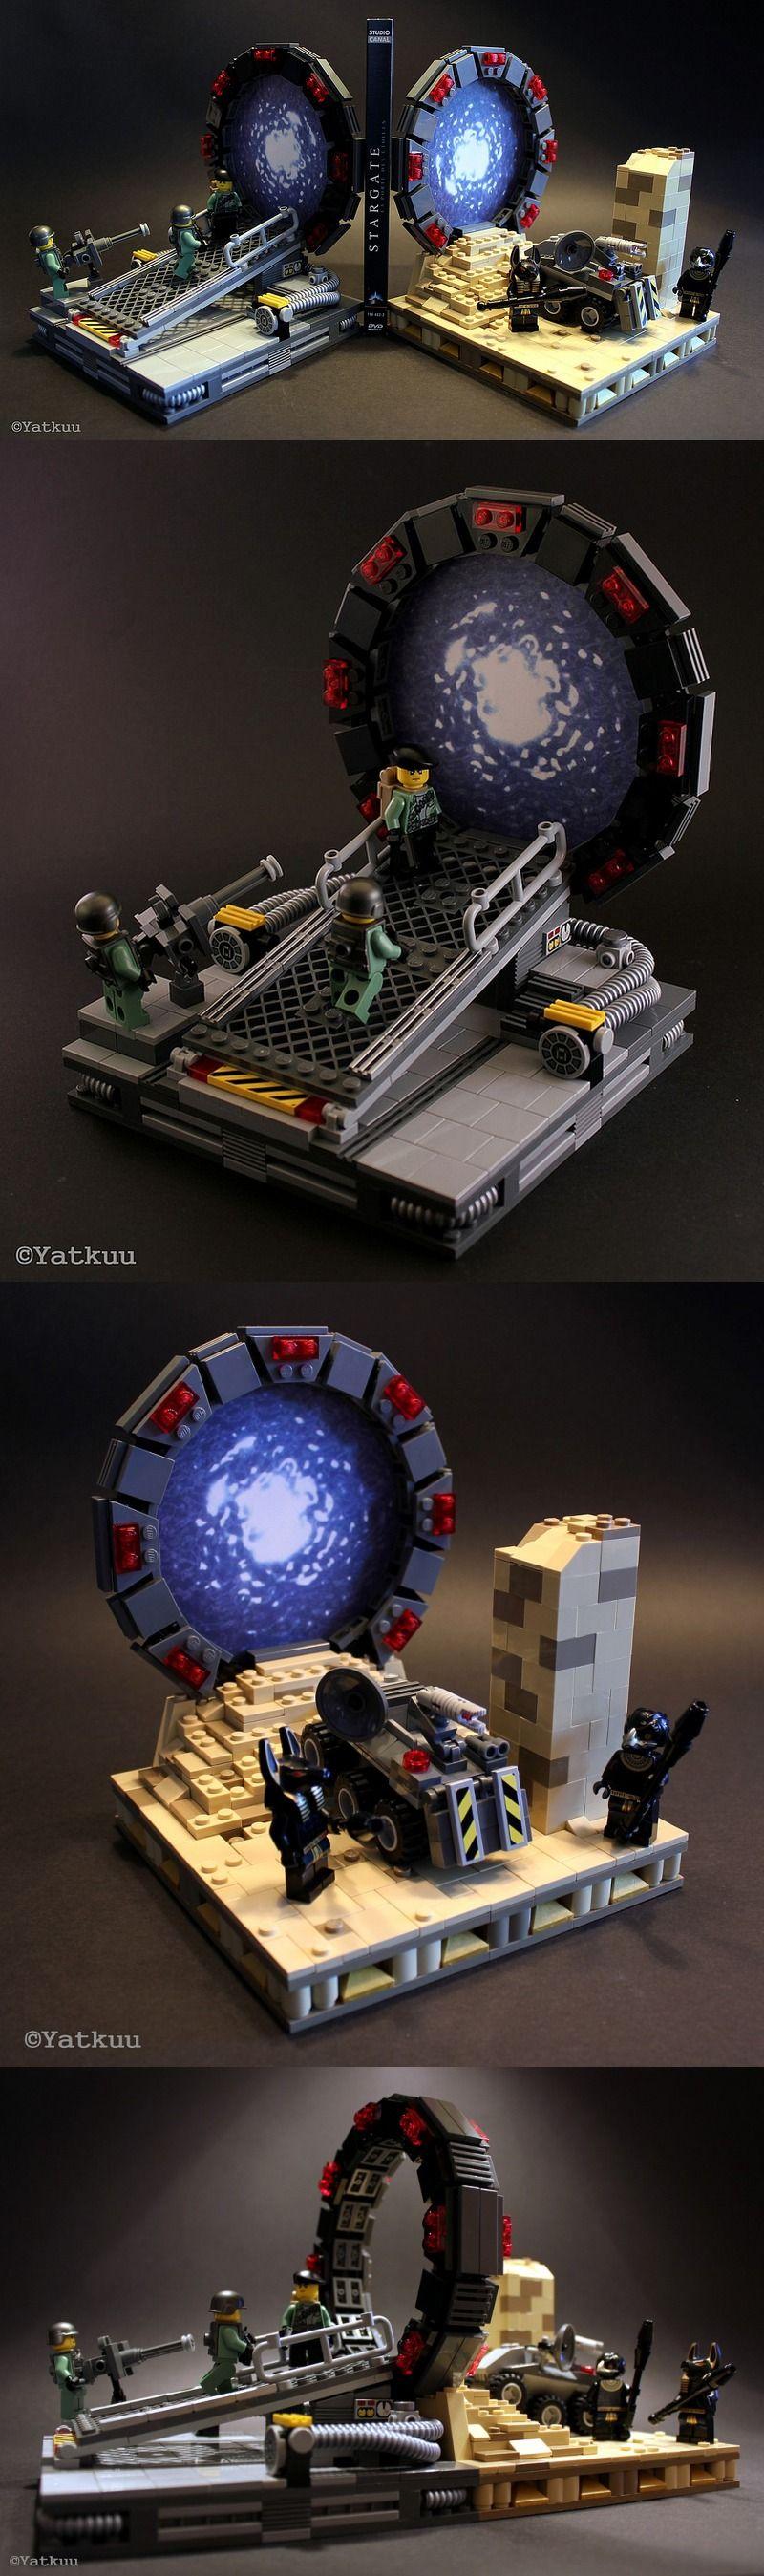 Oh my gosh its lego stargate!! LEGO Stargate bookends @Aaron Kapor Kapor Kapor Hankins